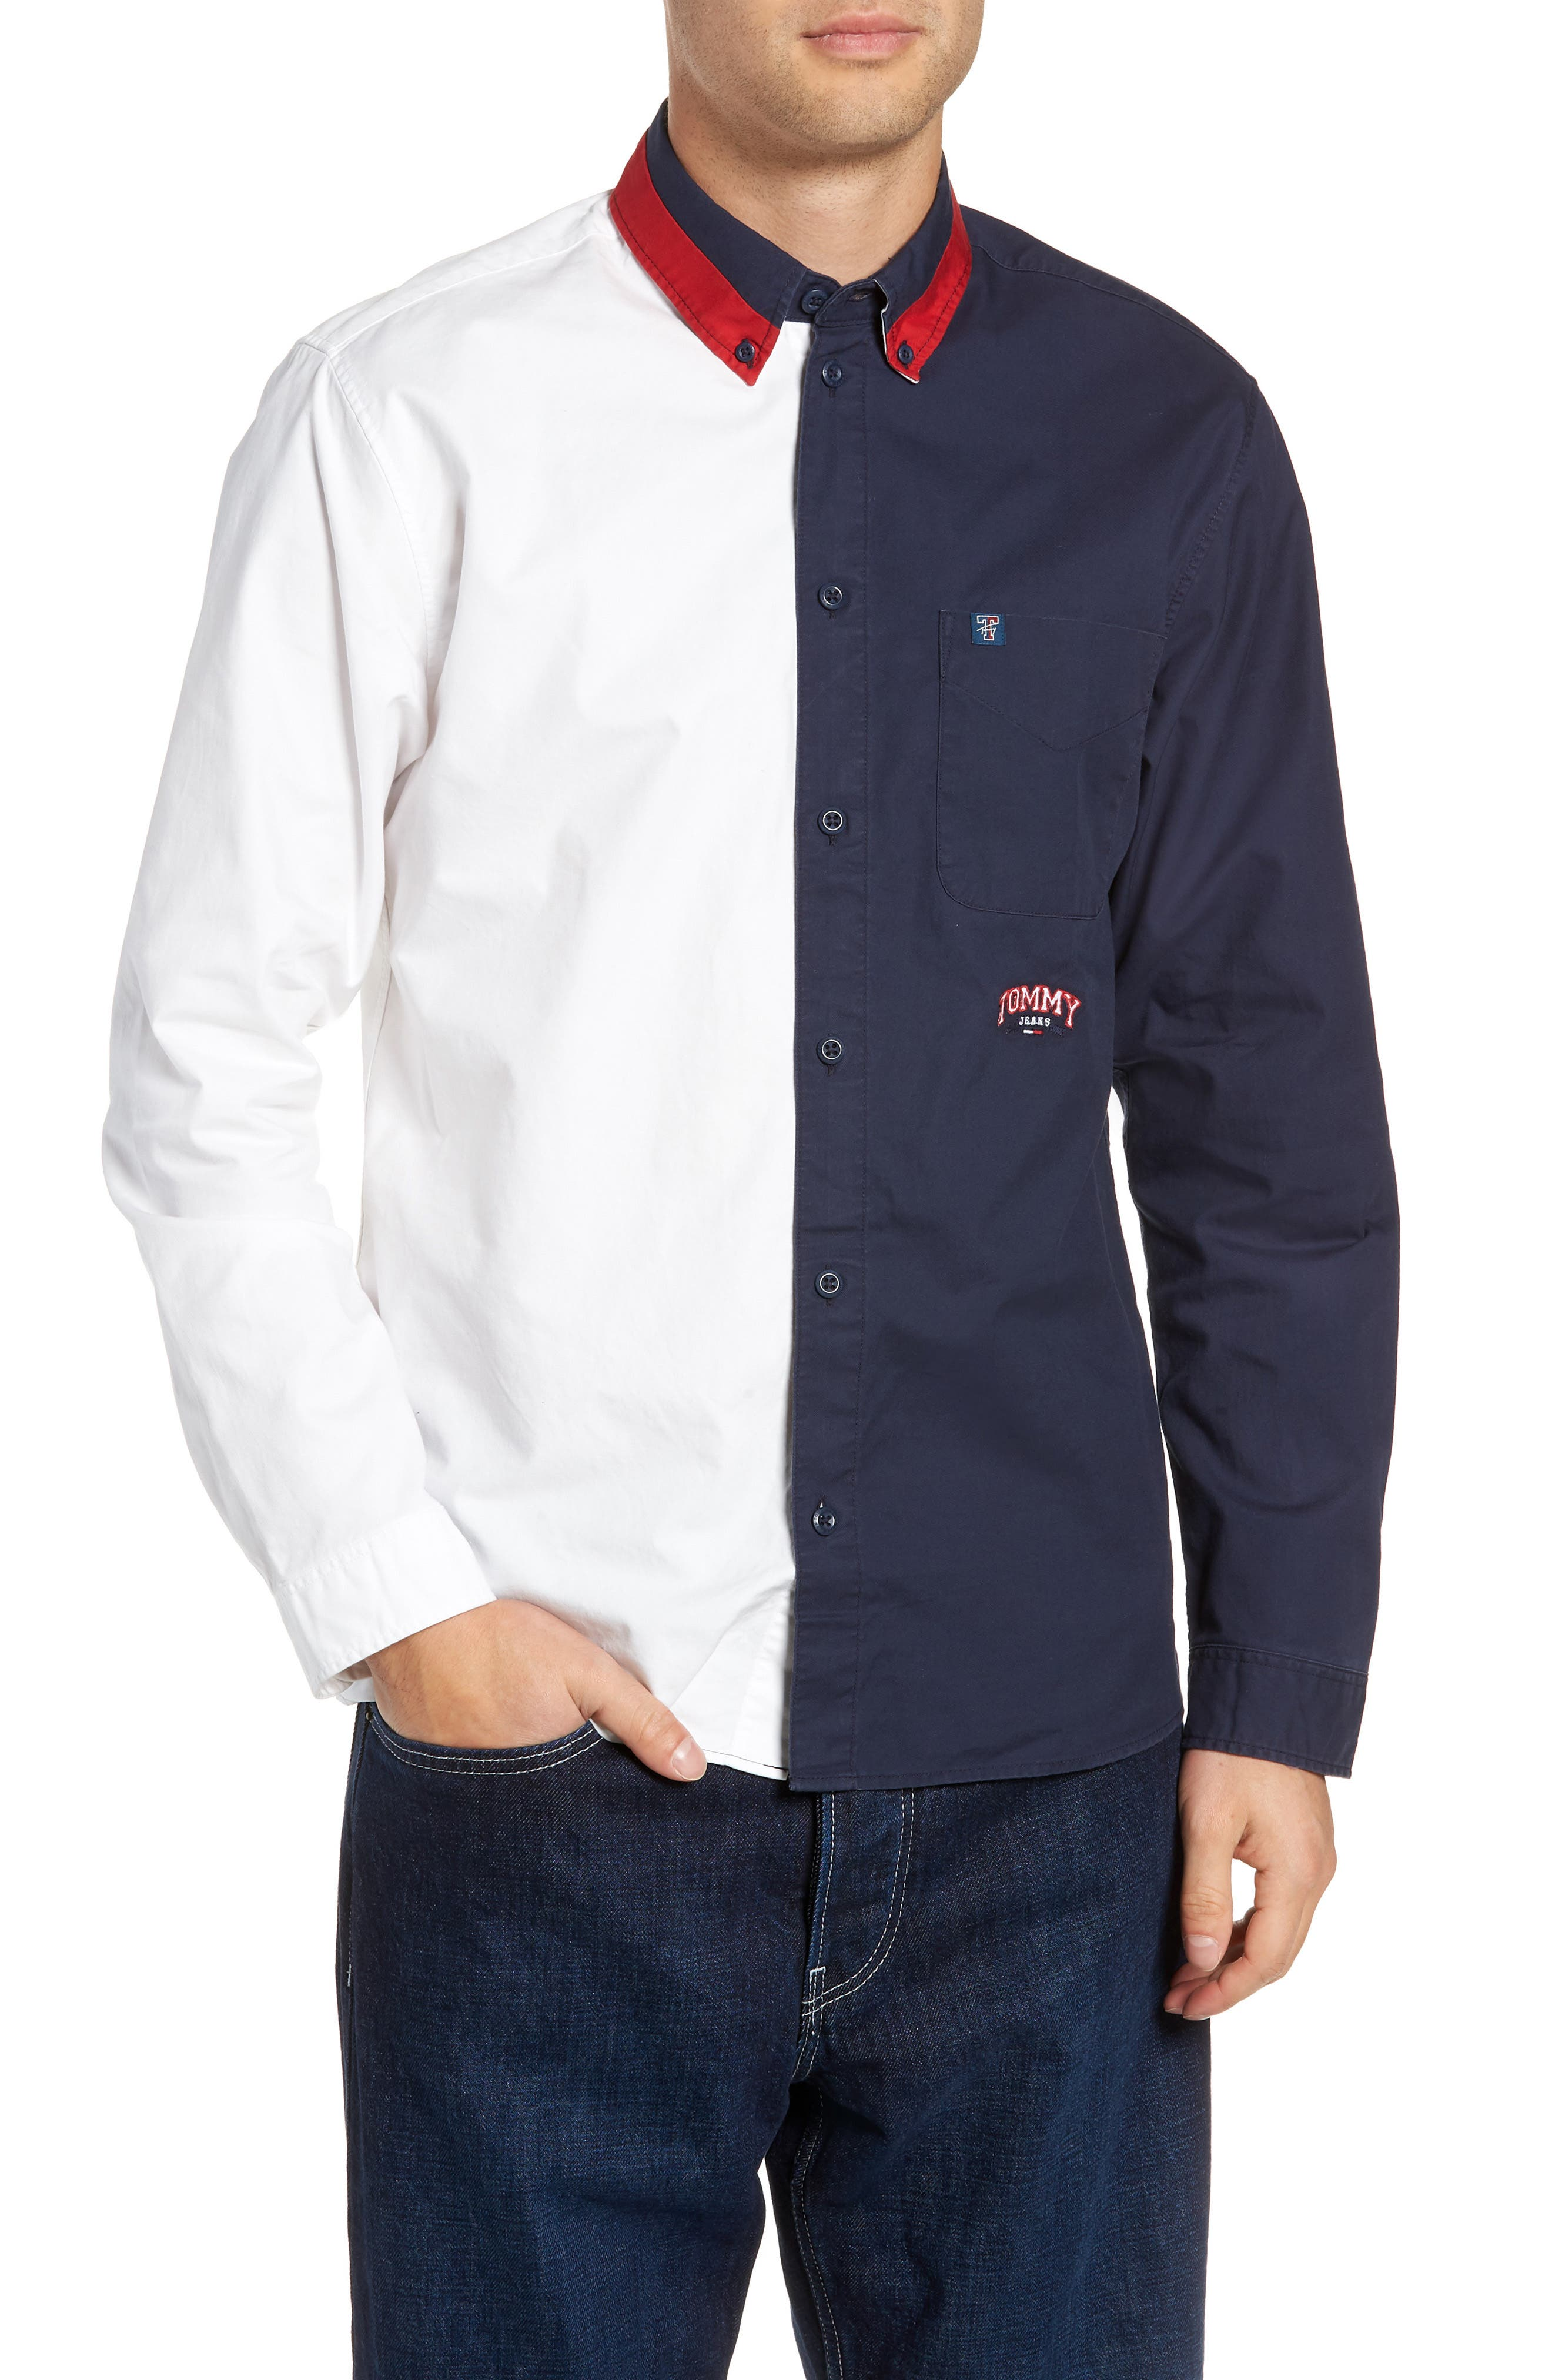 Half & Half Shirt,                             Main thumbnail 1, color,                             CLASSIC WHITE / BLACK IRIS